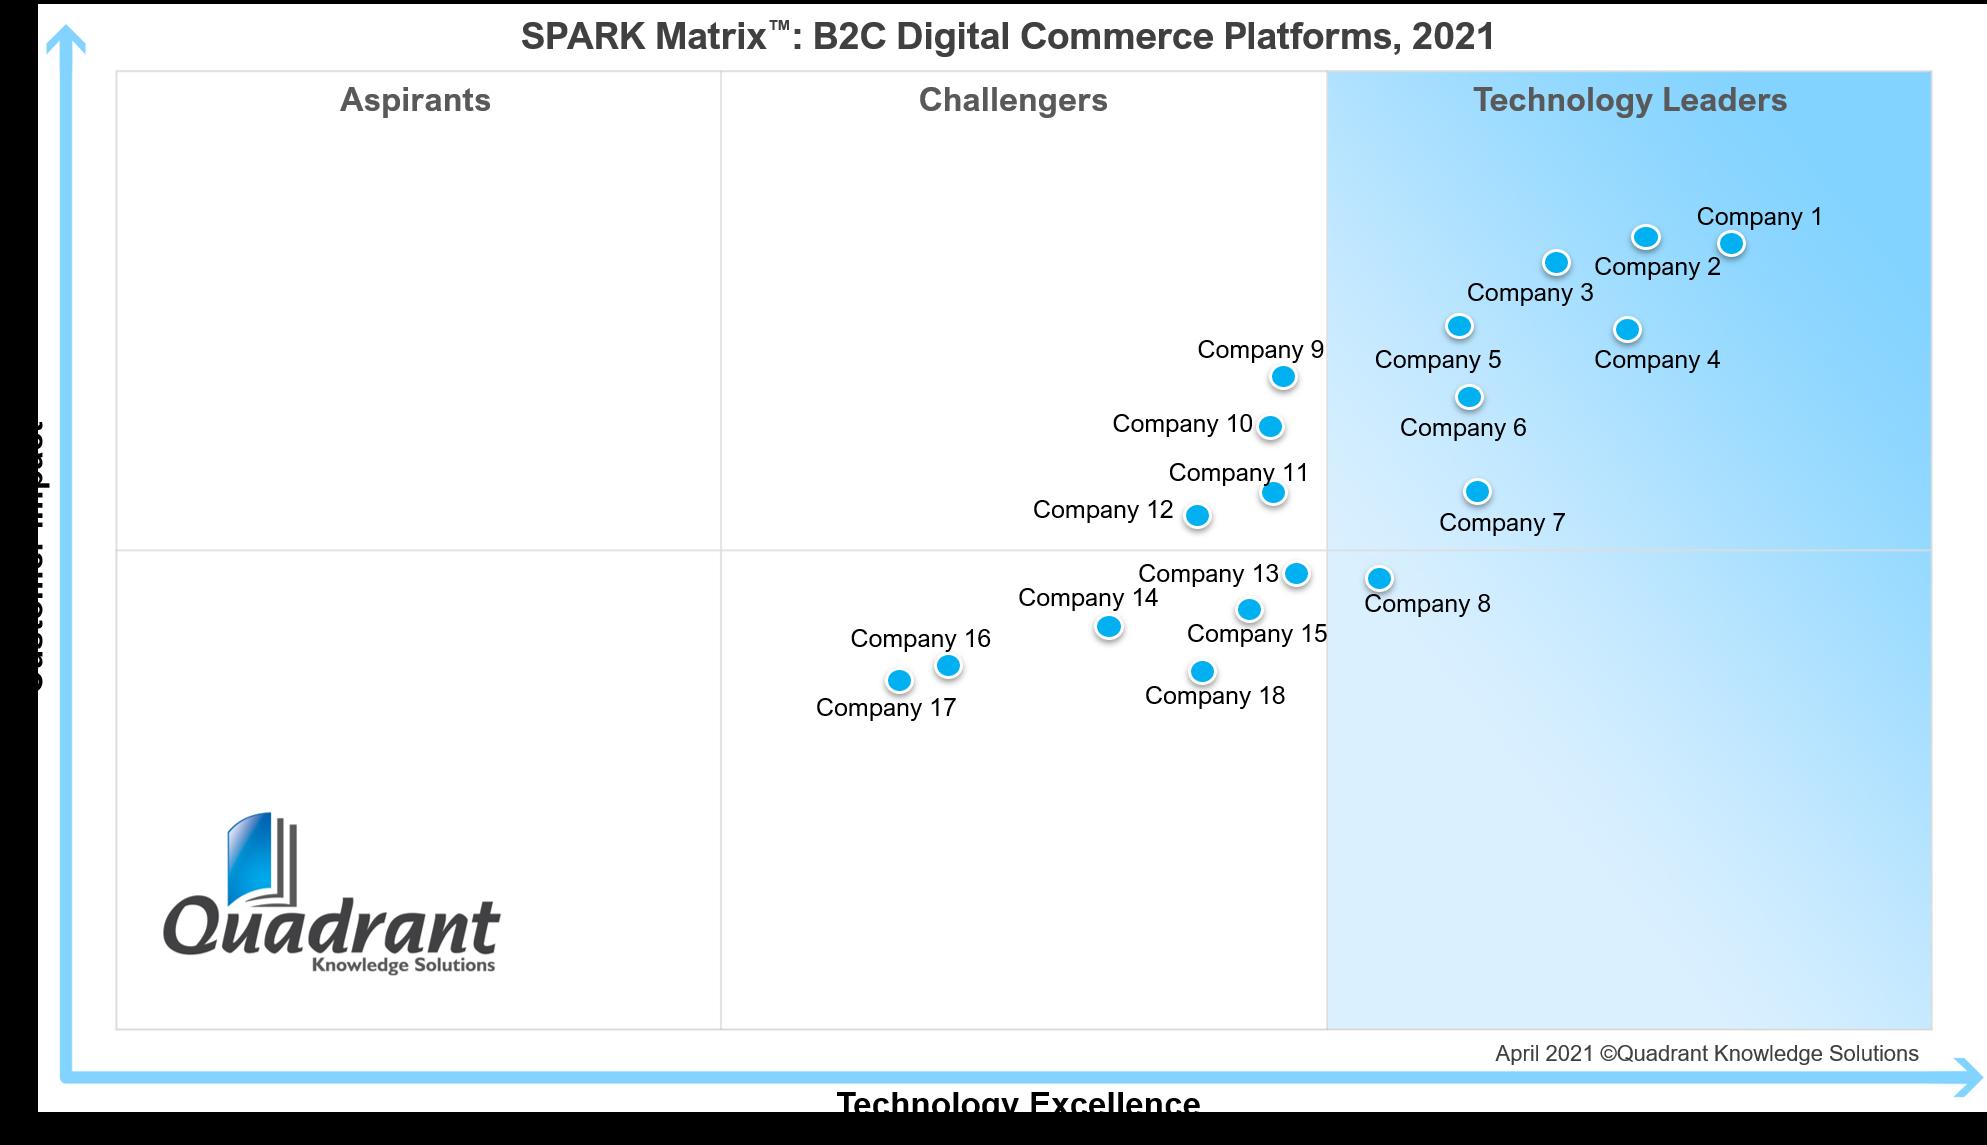 SPARK Matrix B2C Digital Commerce Platforms, 2021